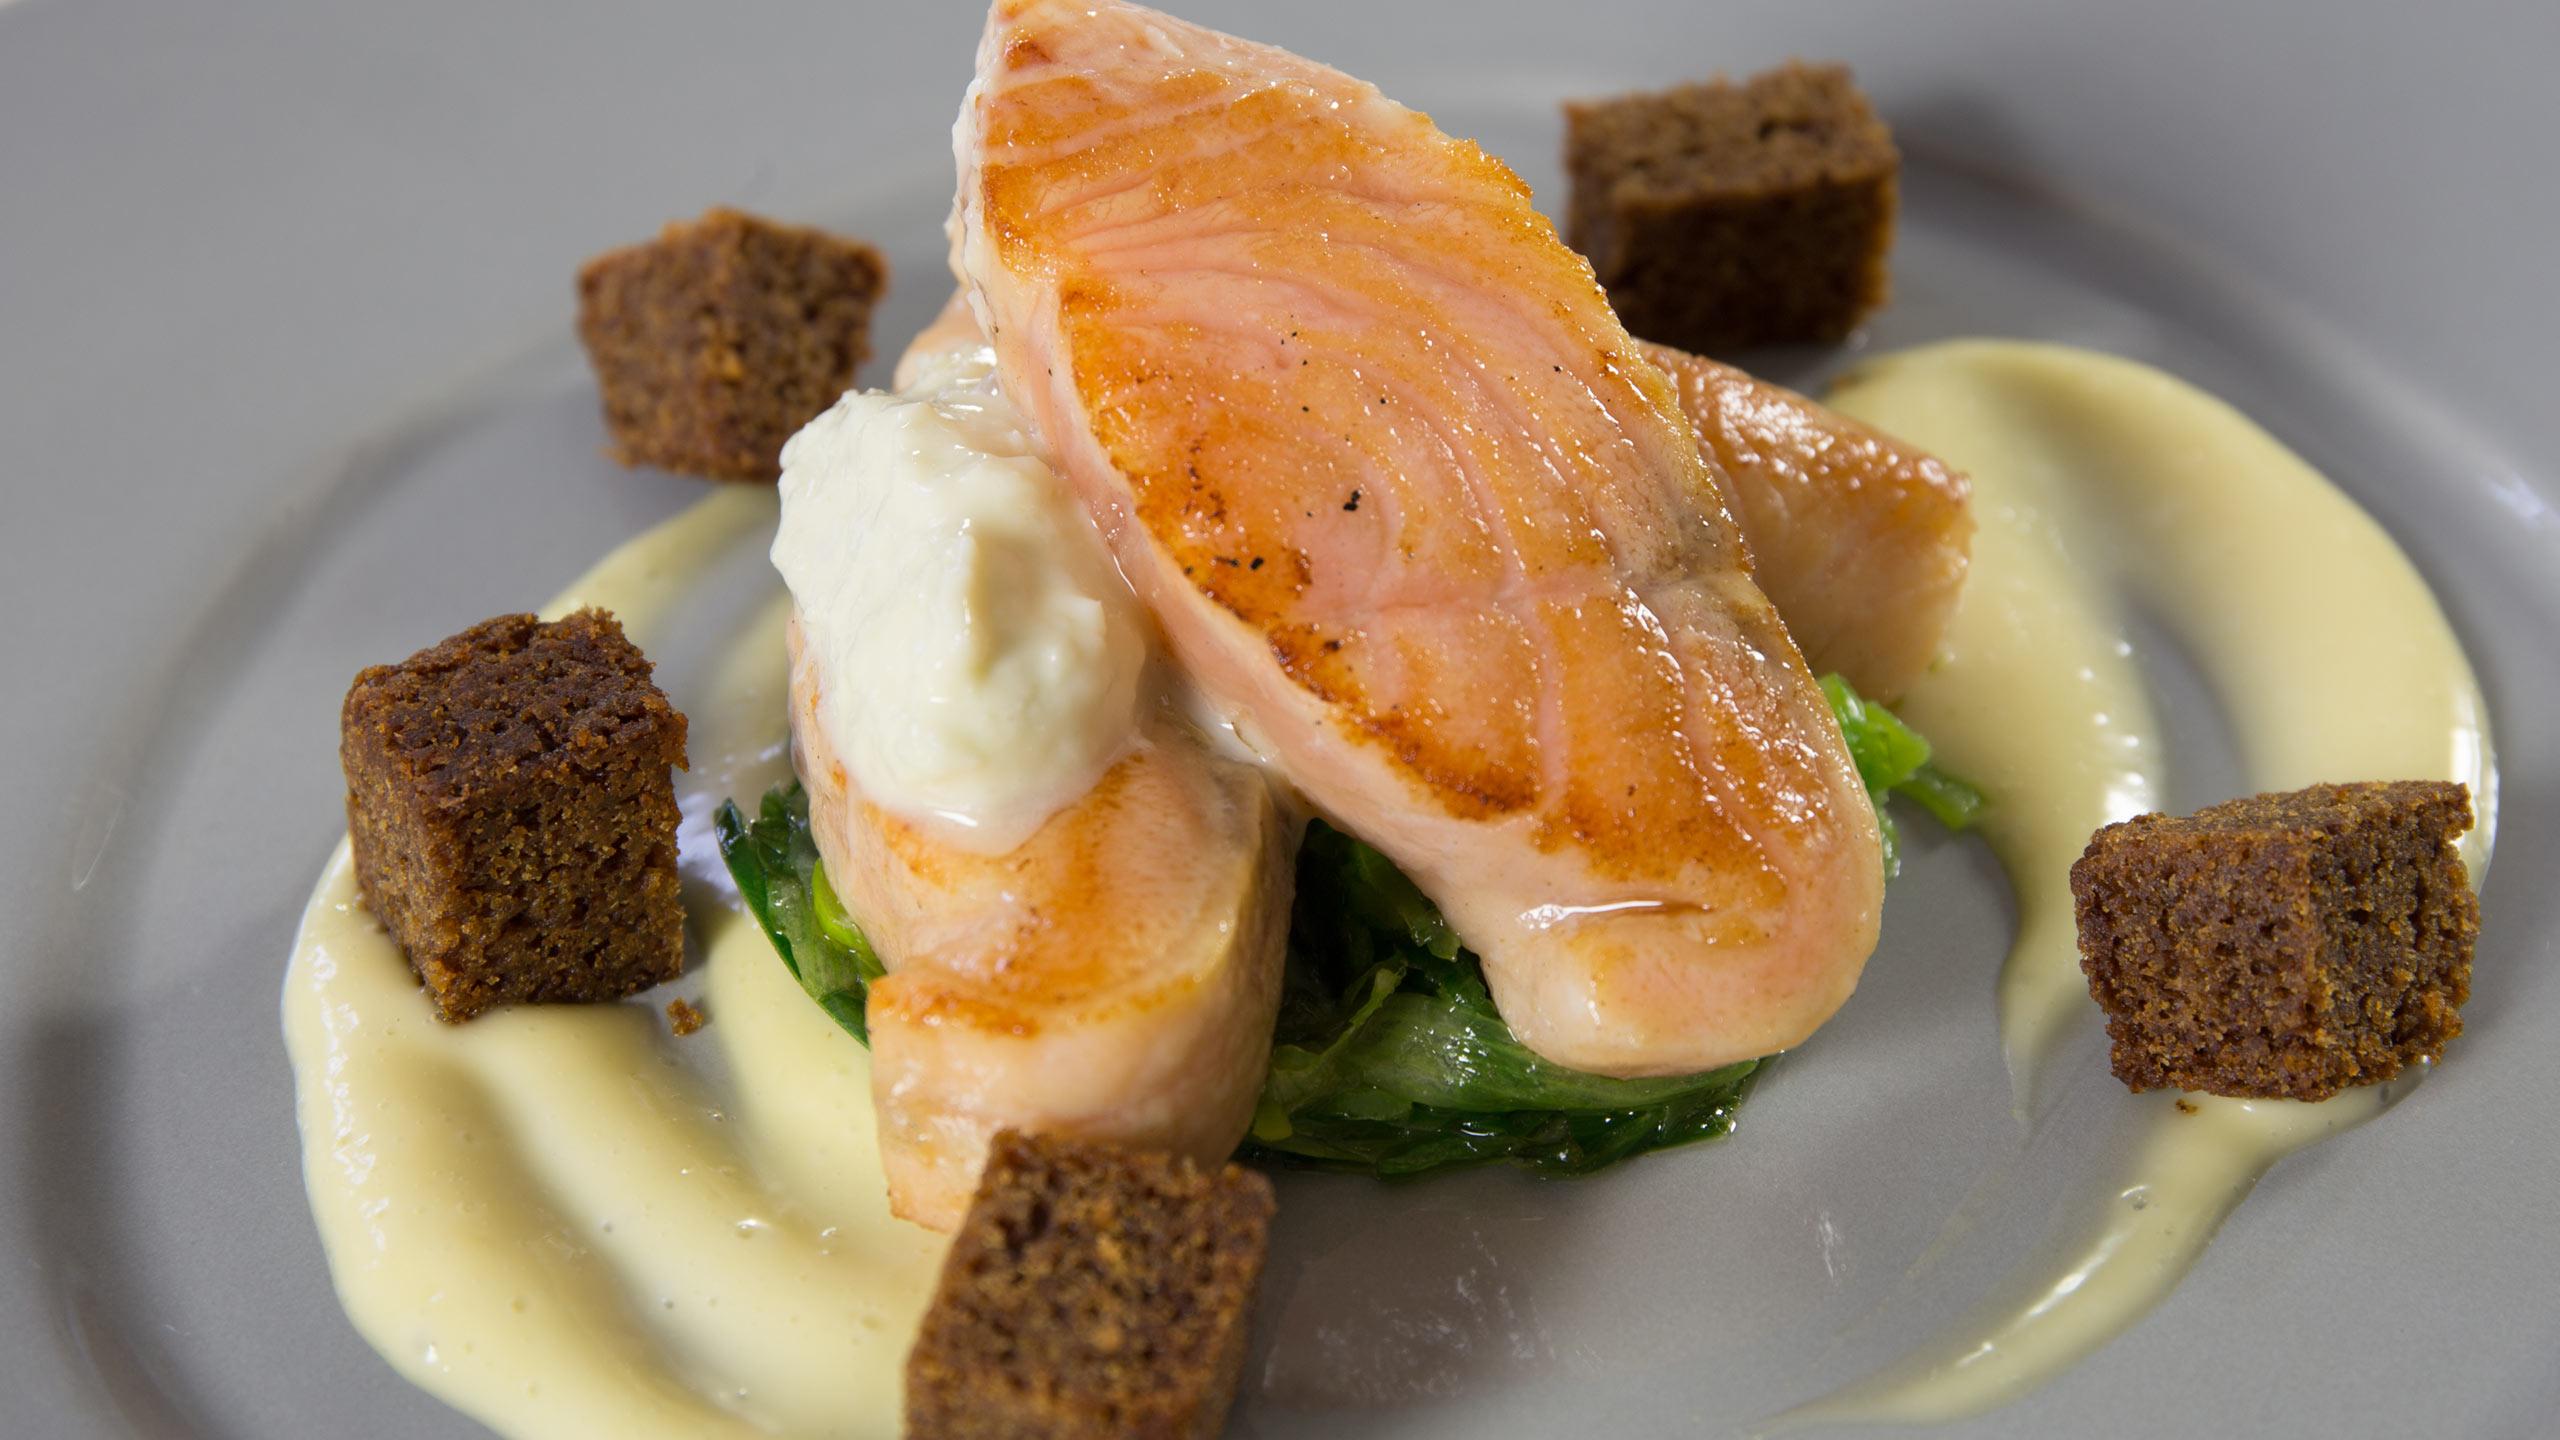 Strattons hotel restaurant. Modern cuisine in the heart of Norfolk